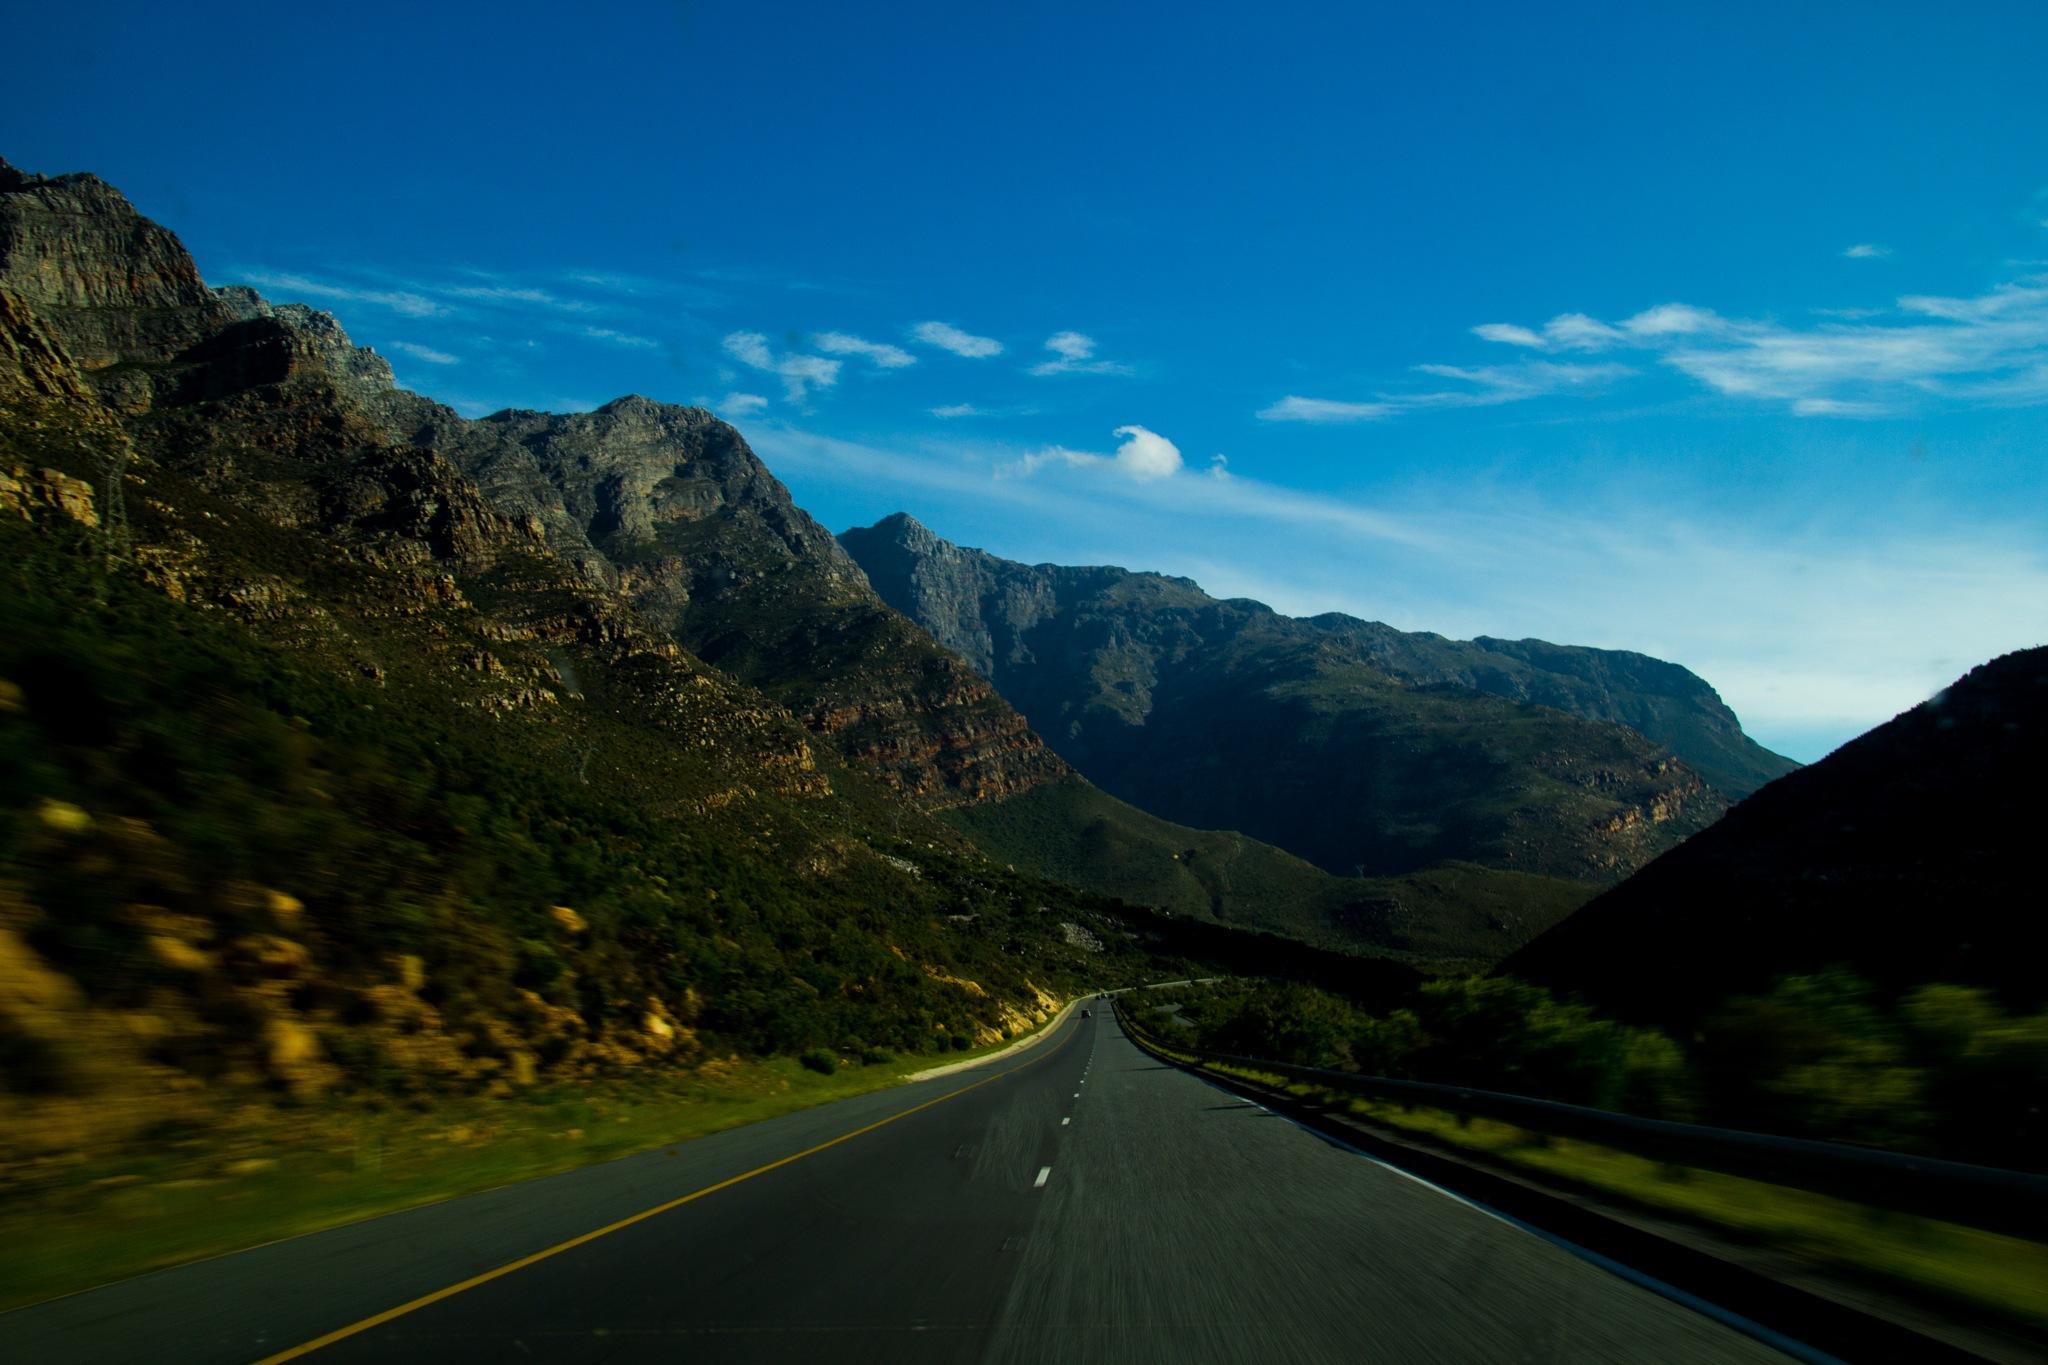 Into the mountains by Nauta Piscatorque